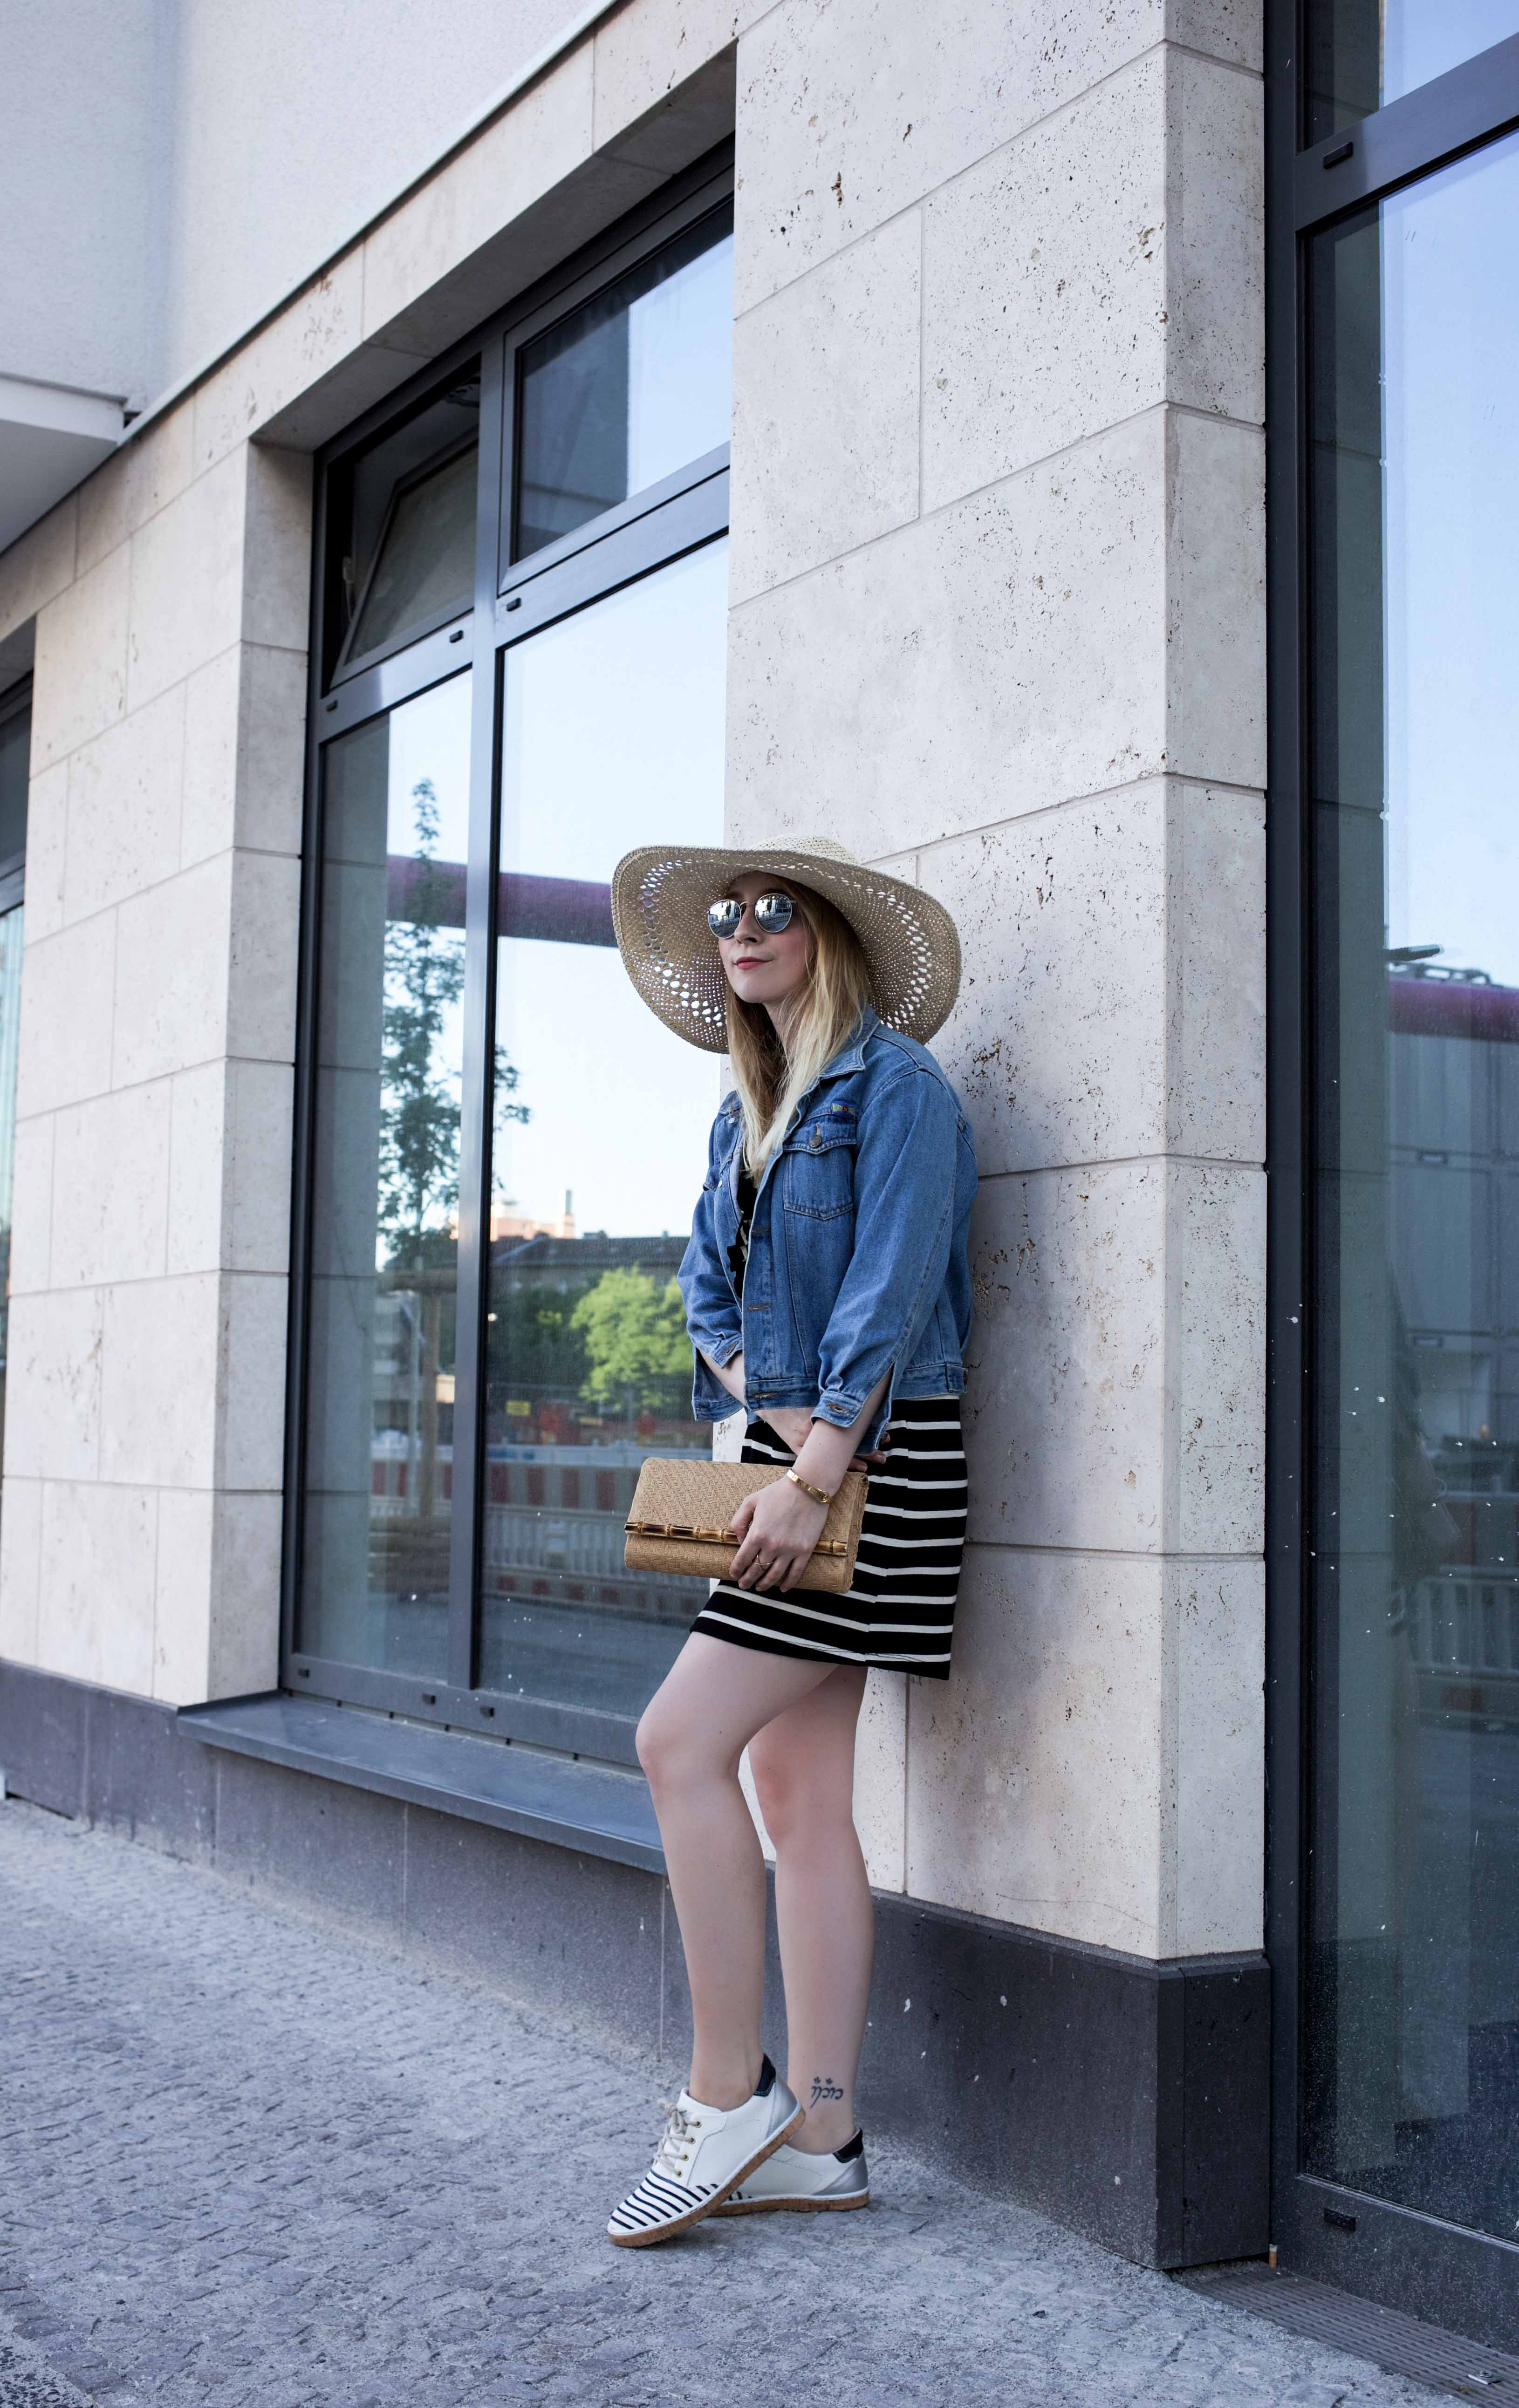 modeblog-fashionblog-berlin-köln-cologne-sonnenhut-outfit-fashion-lifestyle-sommerlook